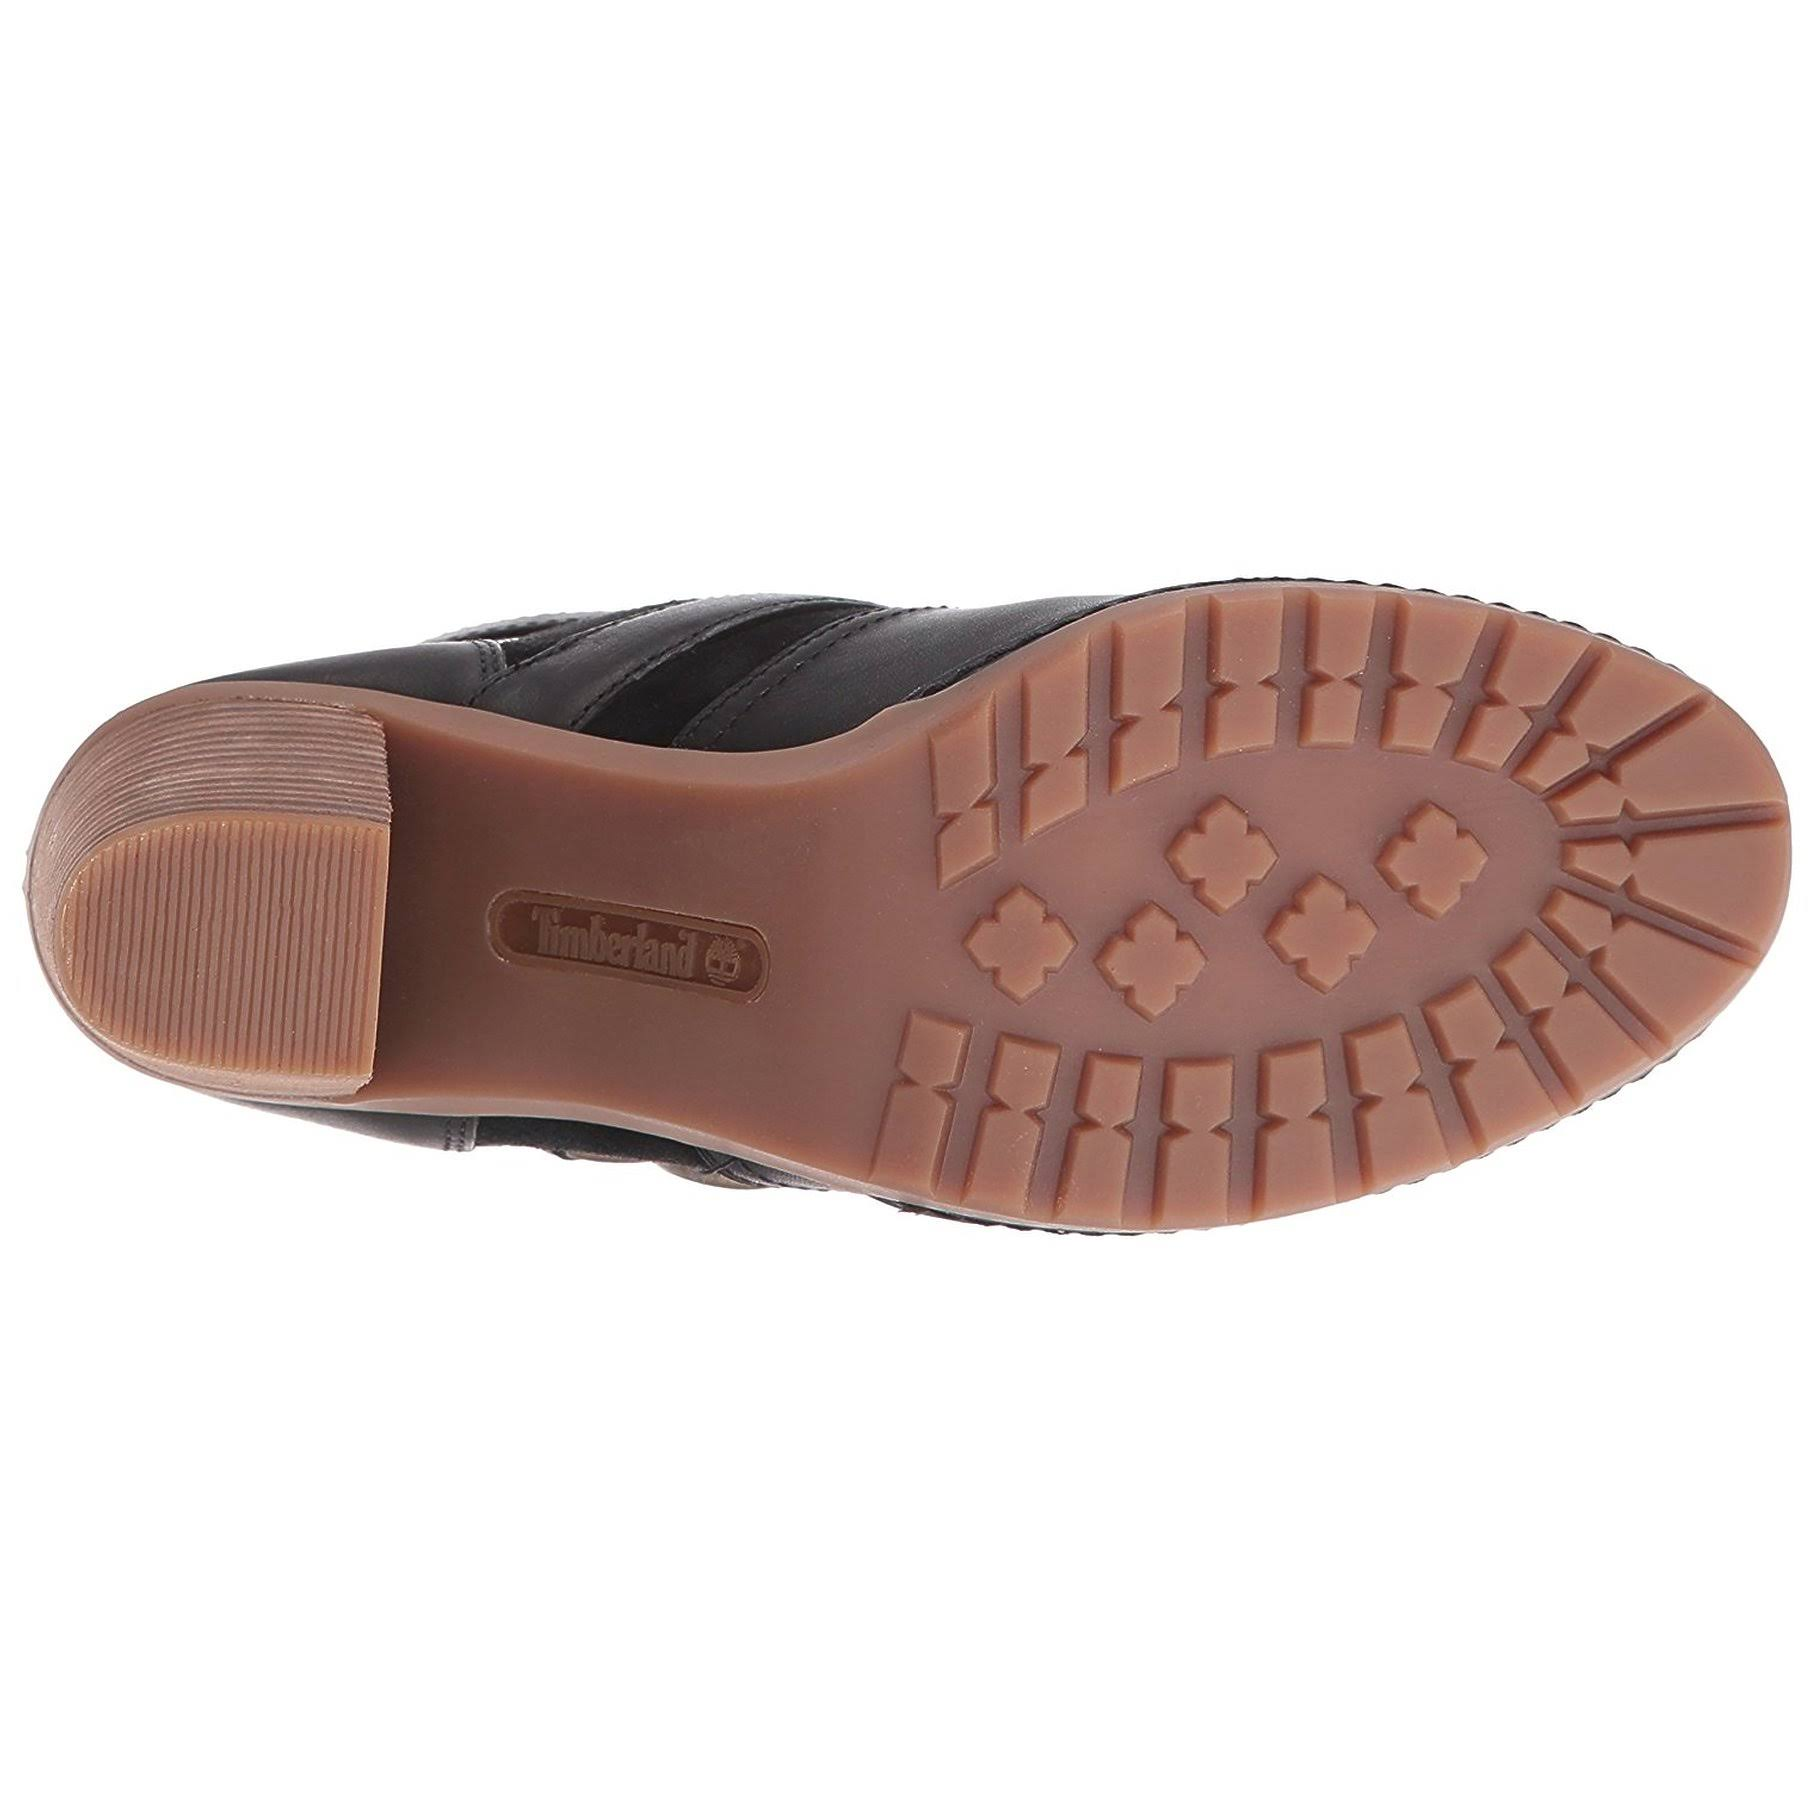 Schwarz 7 Ankle 5m 150 Größe Us Timberland Boots Dennett Damen Leder Orig tWWR8q